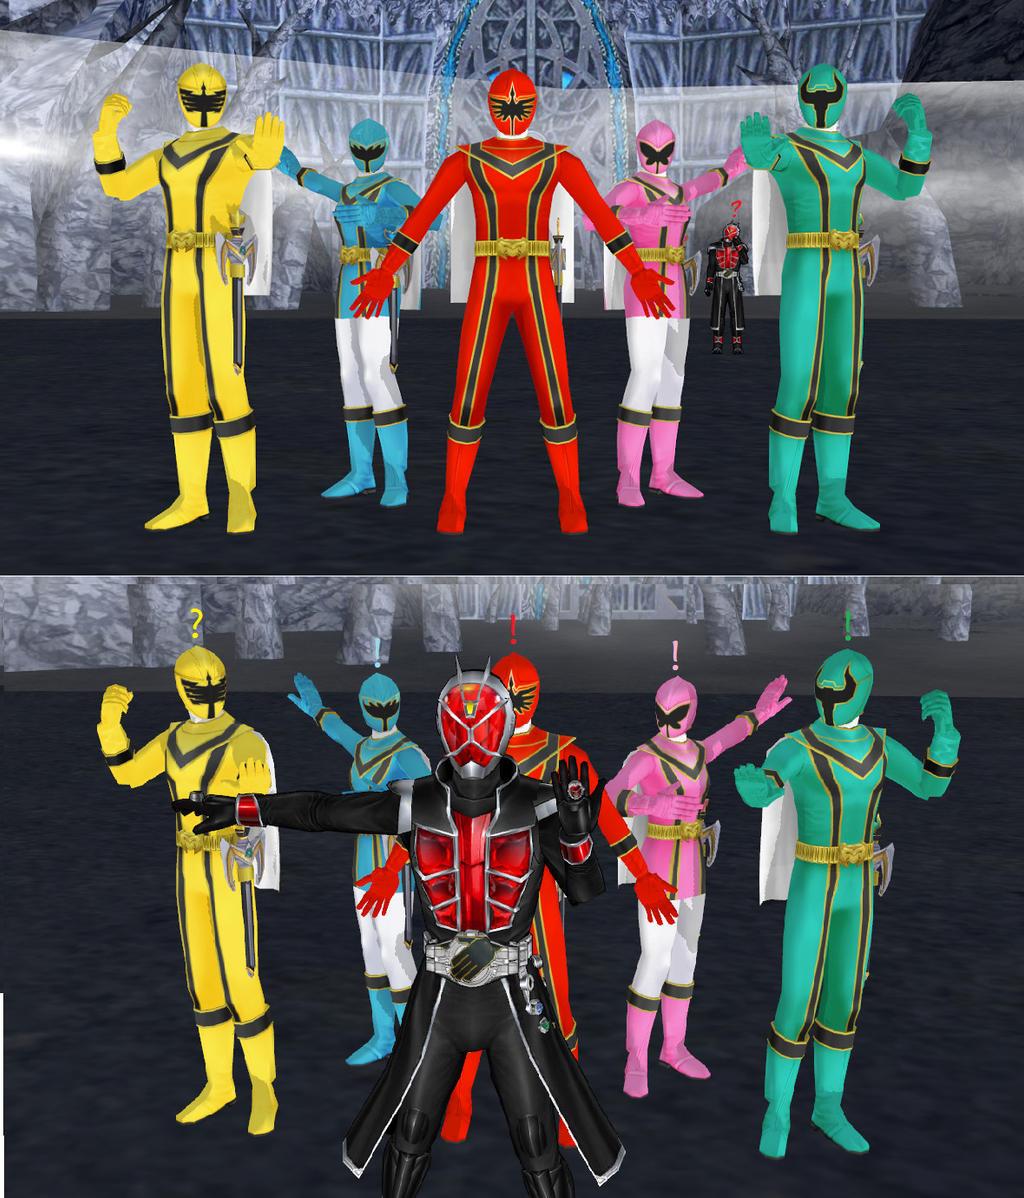 Mahou Sentai Wizardranger! by MIST-TO-GUN